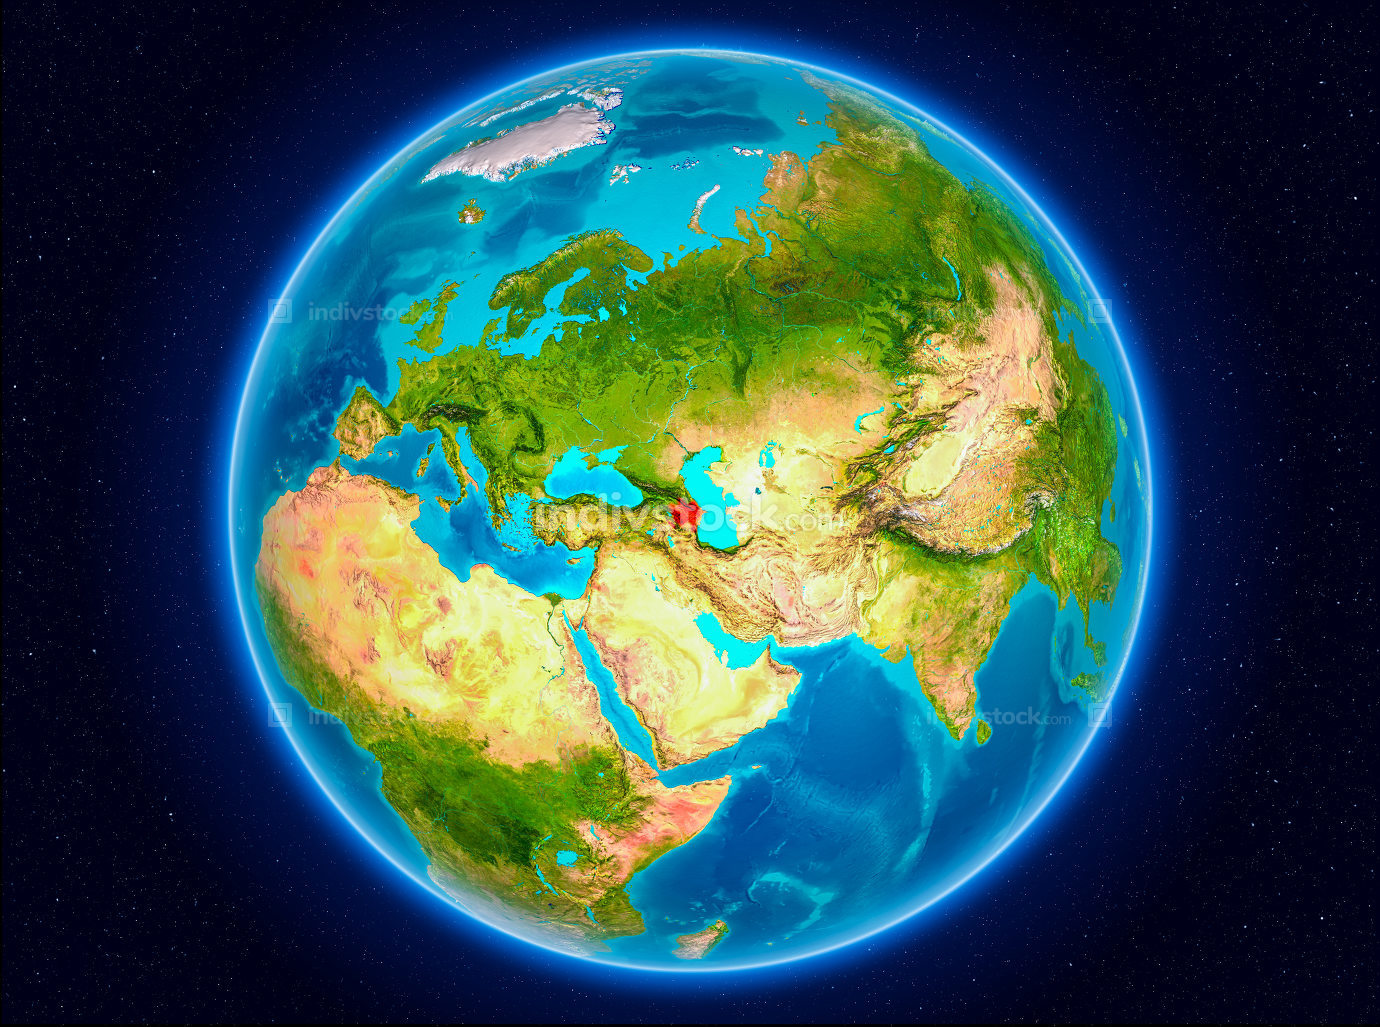 Azerbaijan on Earth